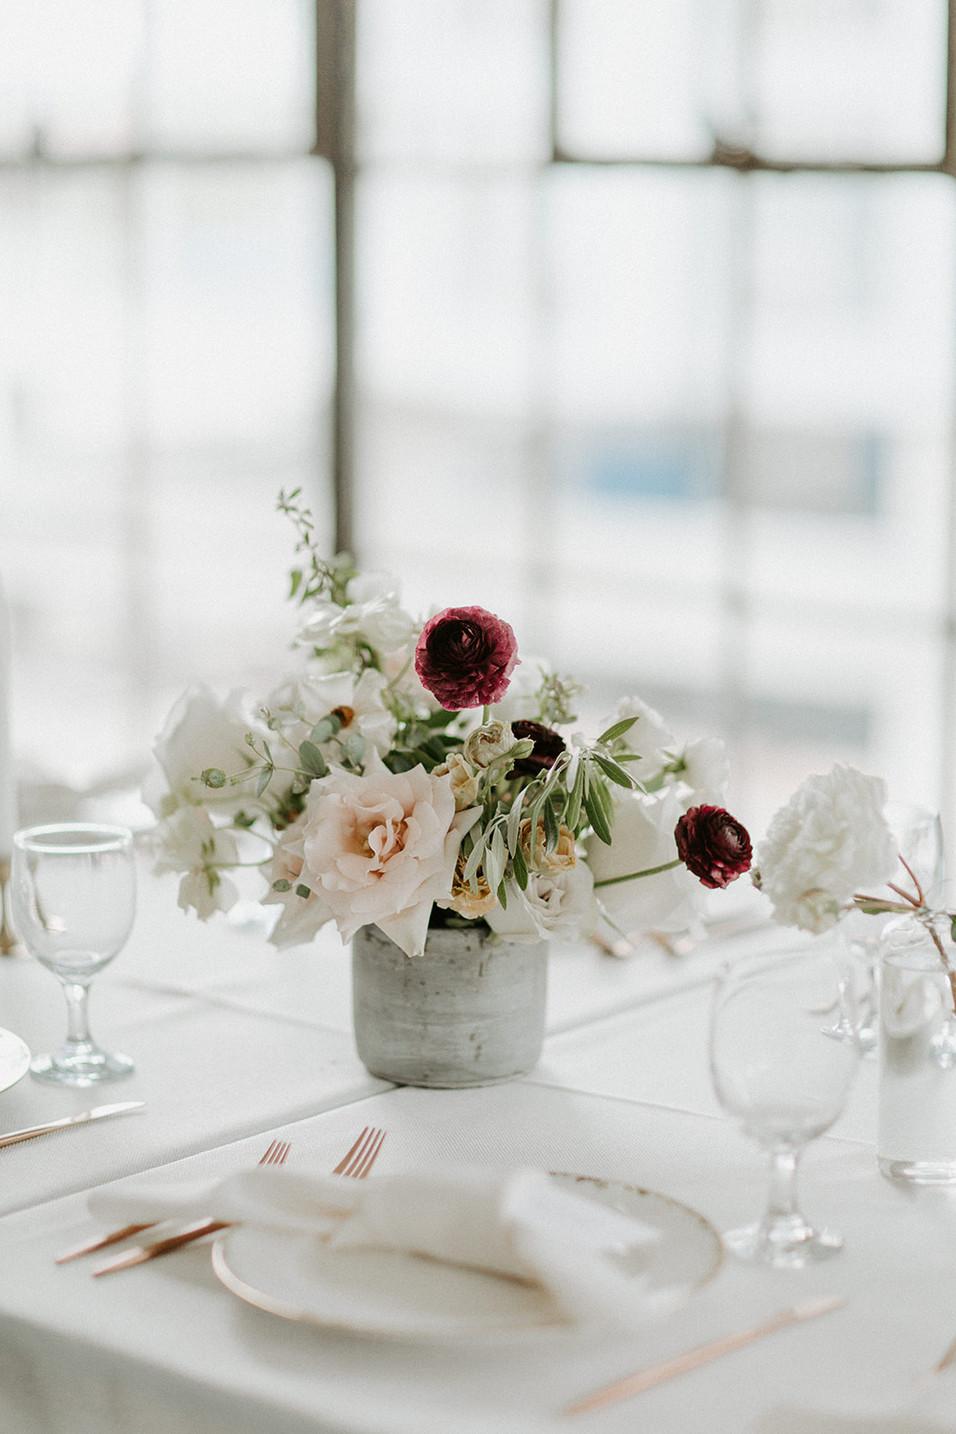 charmaine_ben_wedding_0513_websize.jpg